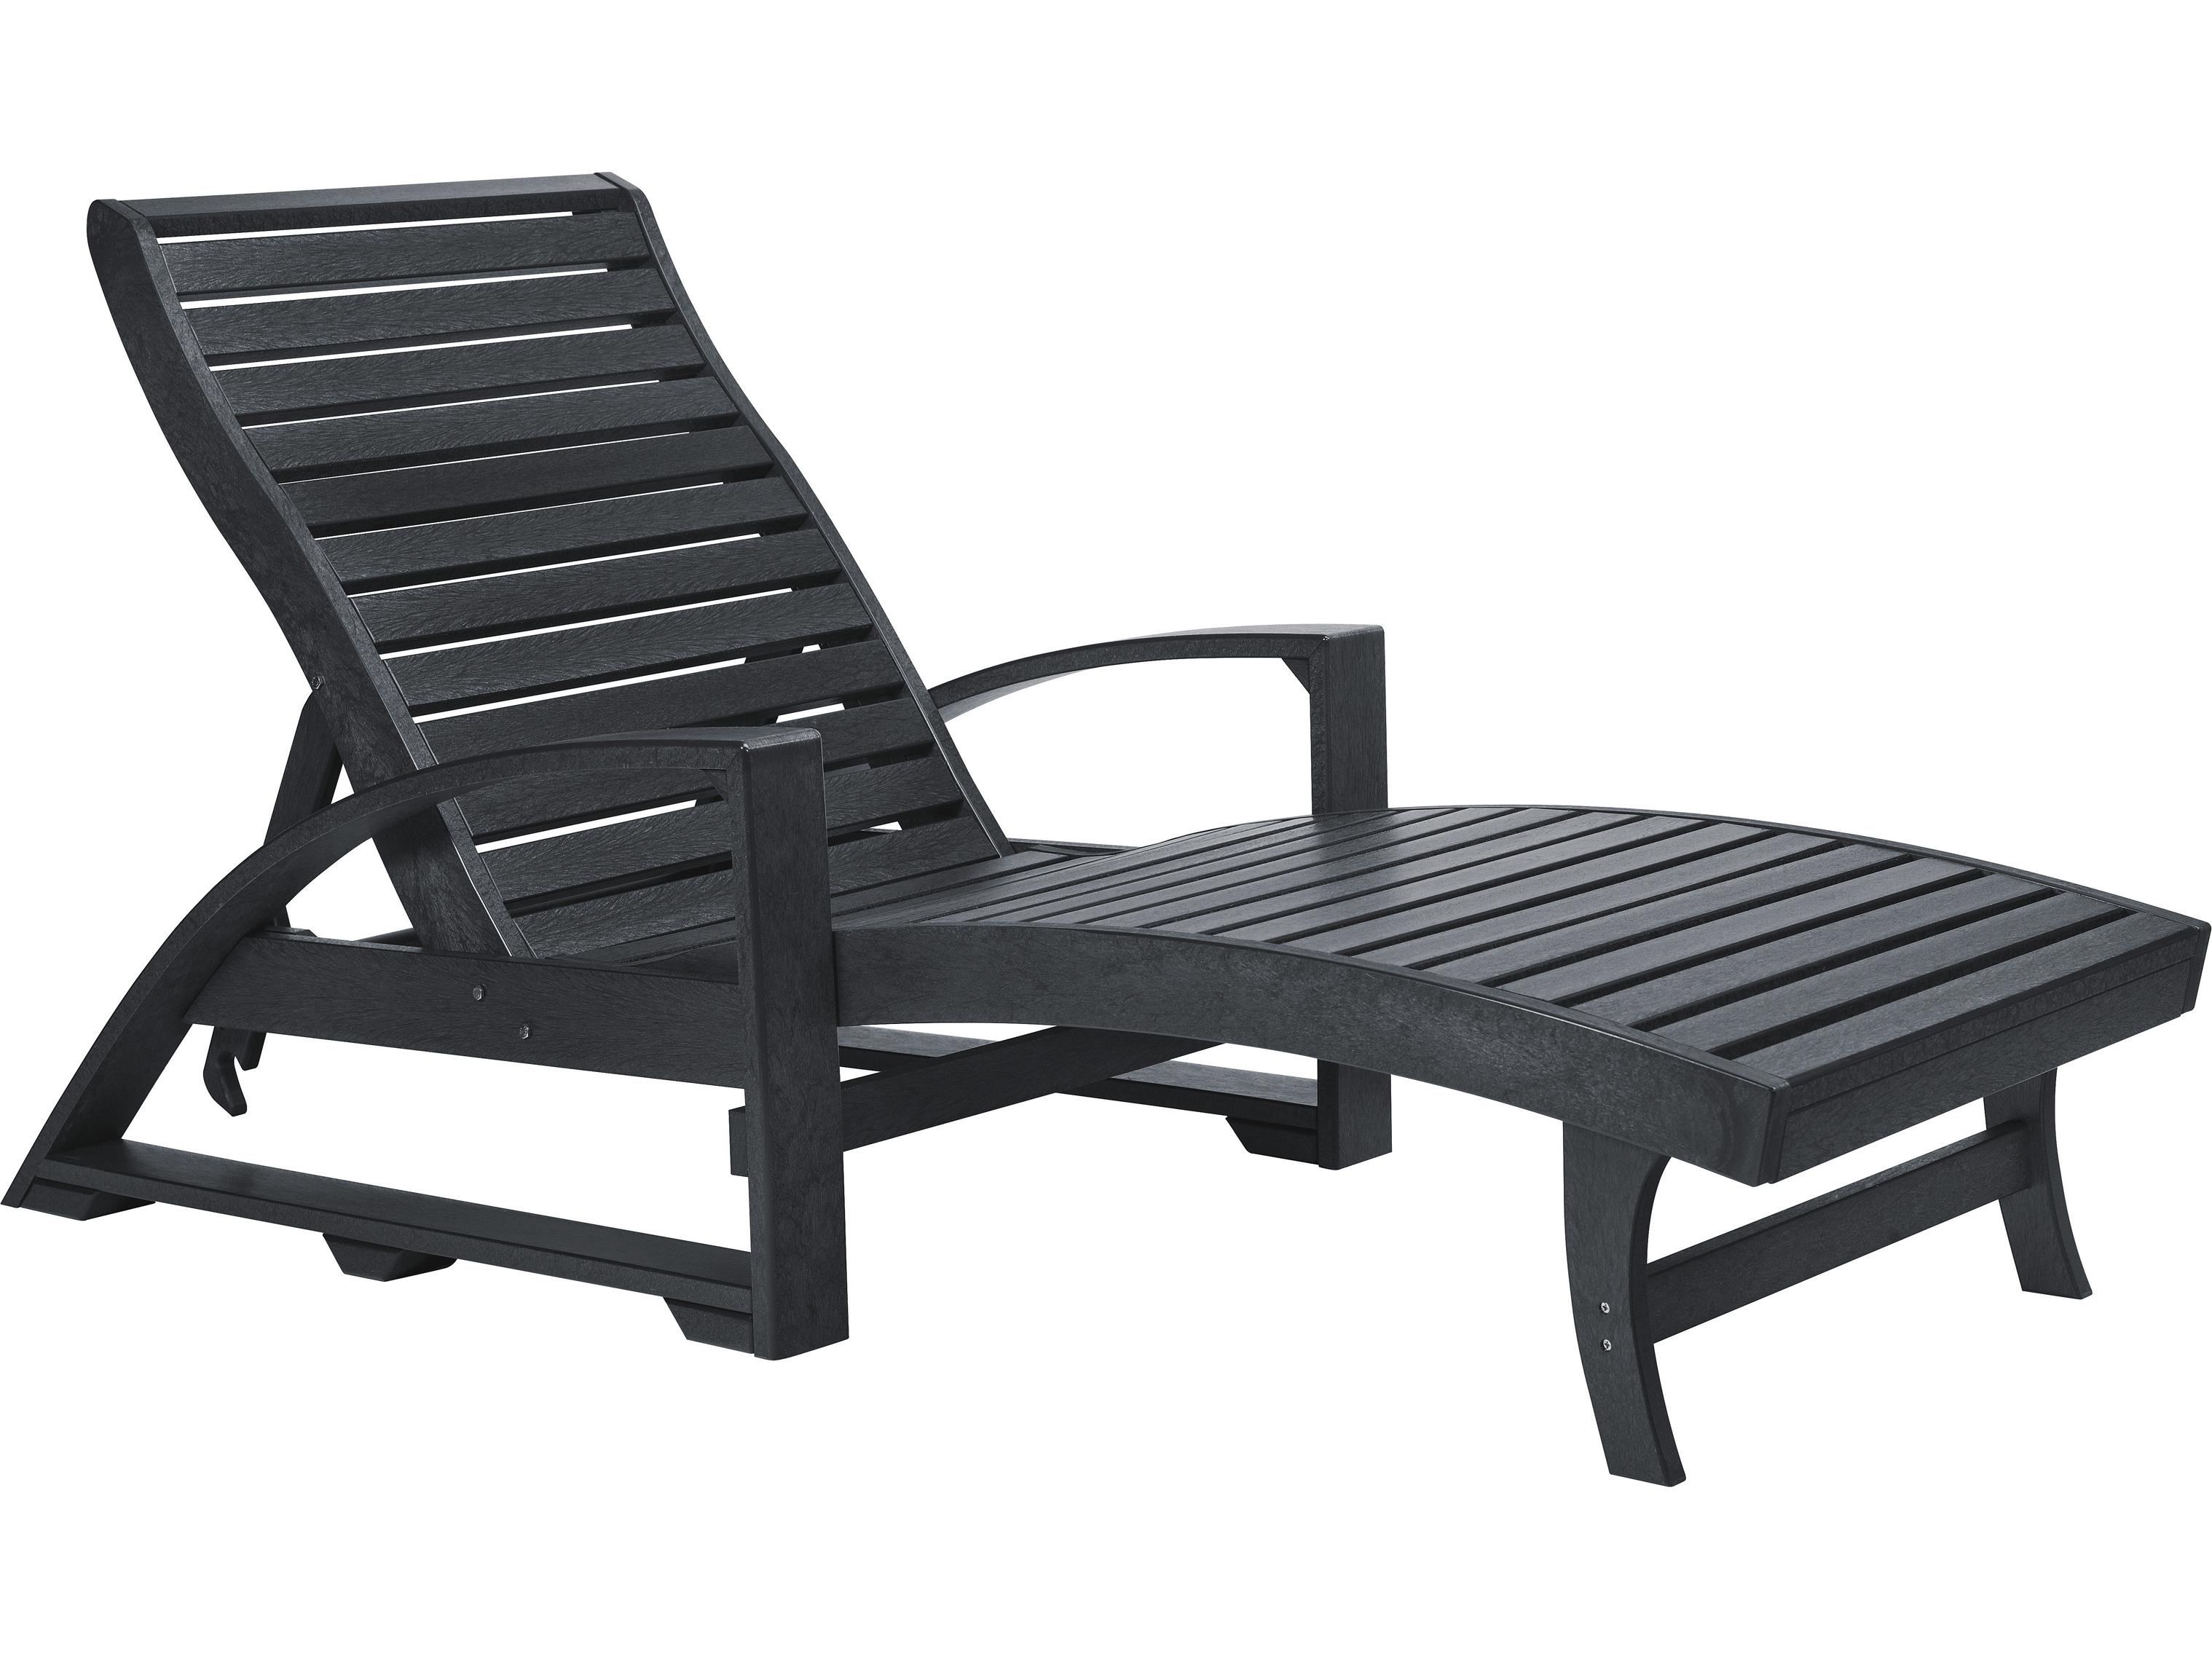 c r plastic st tropez chaise lounge with wheels l38